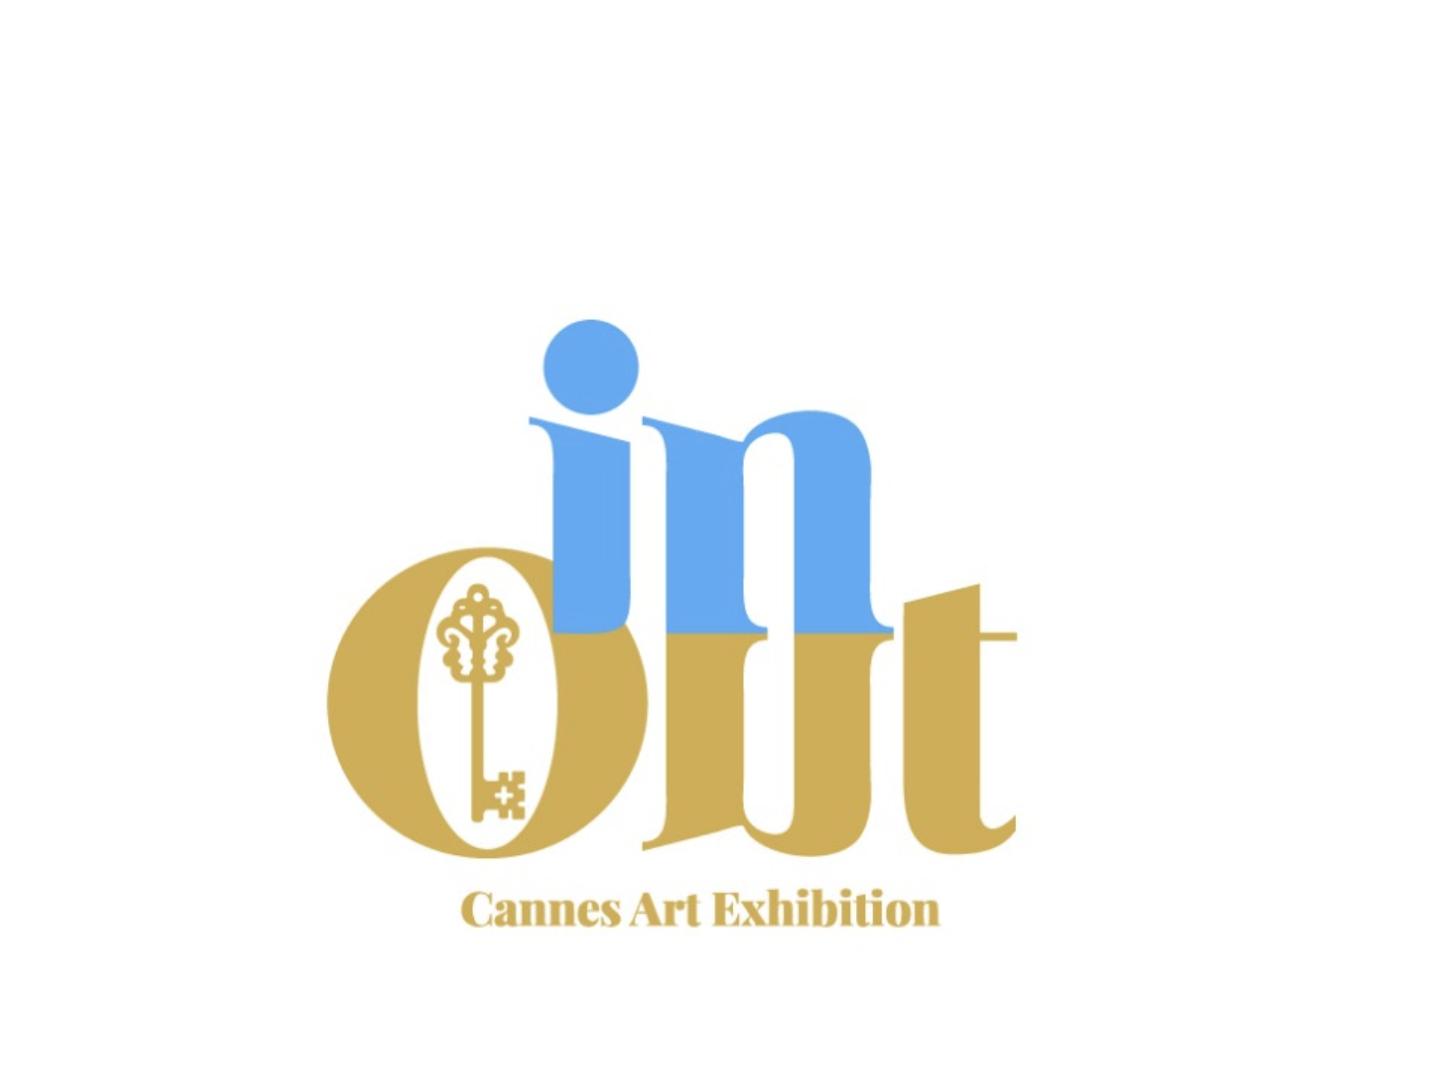 inout exposição apart private gallery cannes (1)